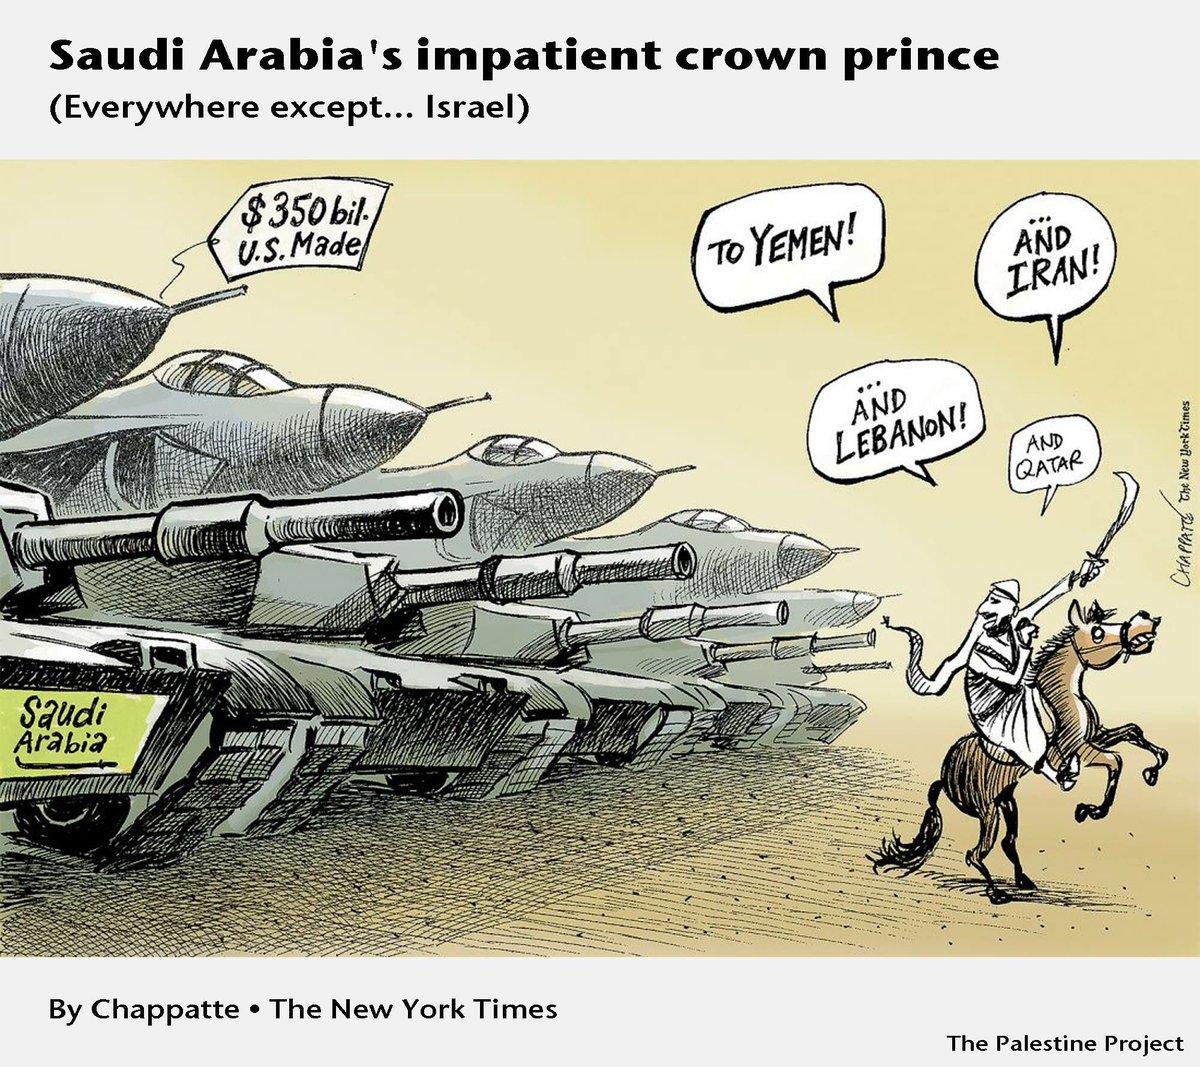 "One depiction of the ""impatient crown prince"" in the New York Times. Accurate?   #SaudiArabia #Lebanon #Qatar #Yemen #Hariri #SaadHariri #Macron #Trump #GulfCrisis #QatarCrisis #Israel <br>http://pic.twitter.com/FKjHrvwANm"